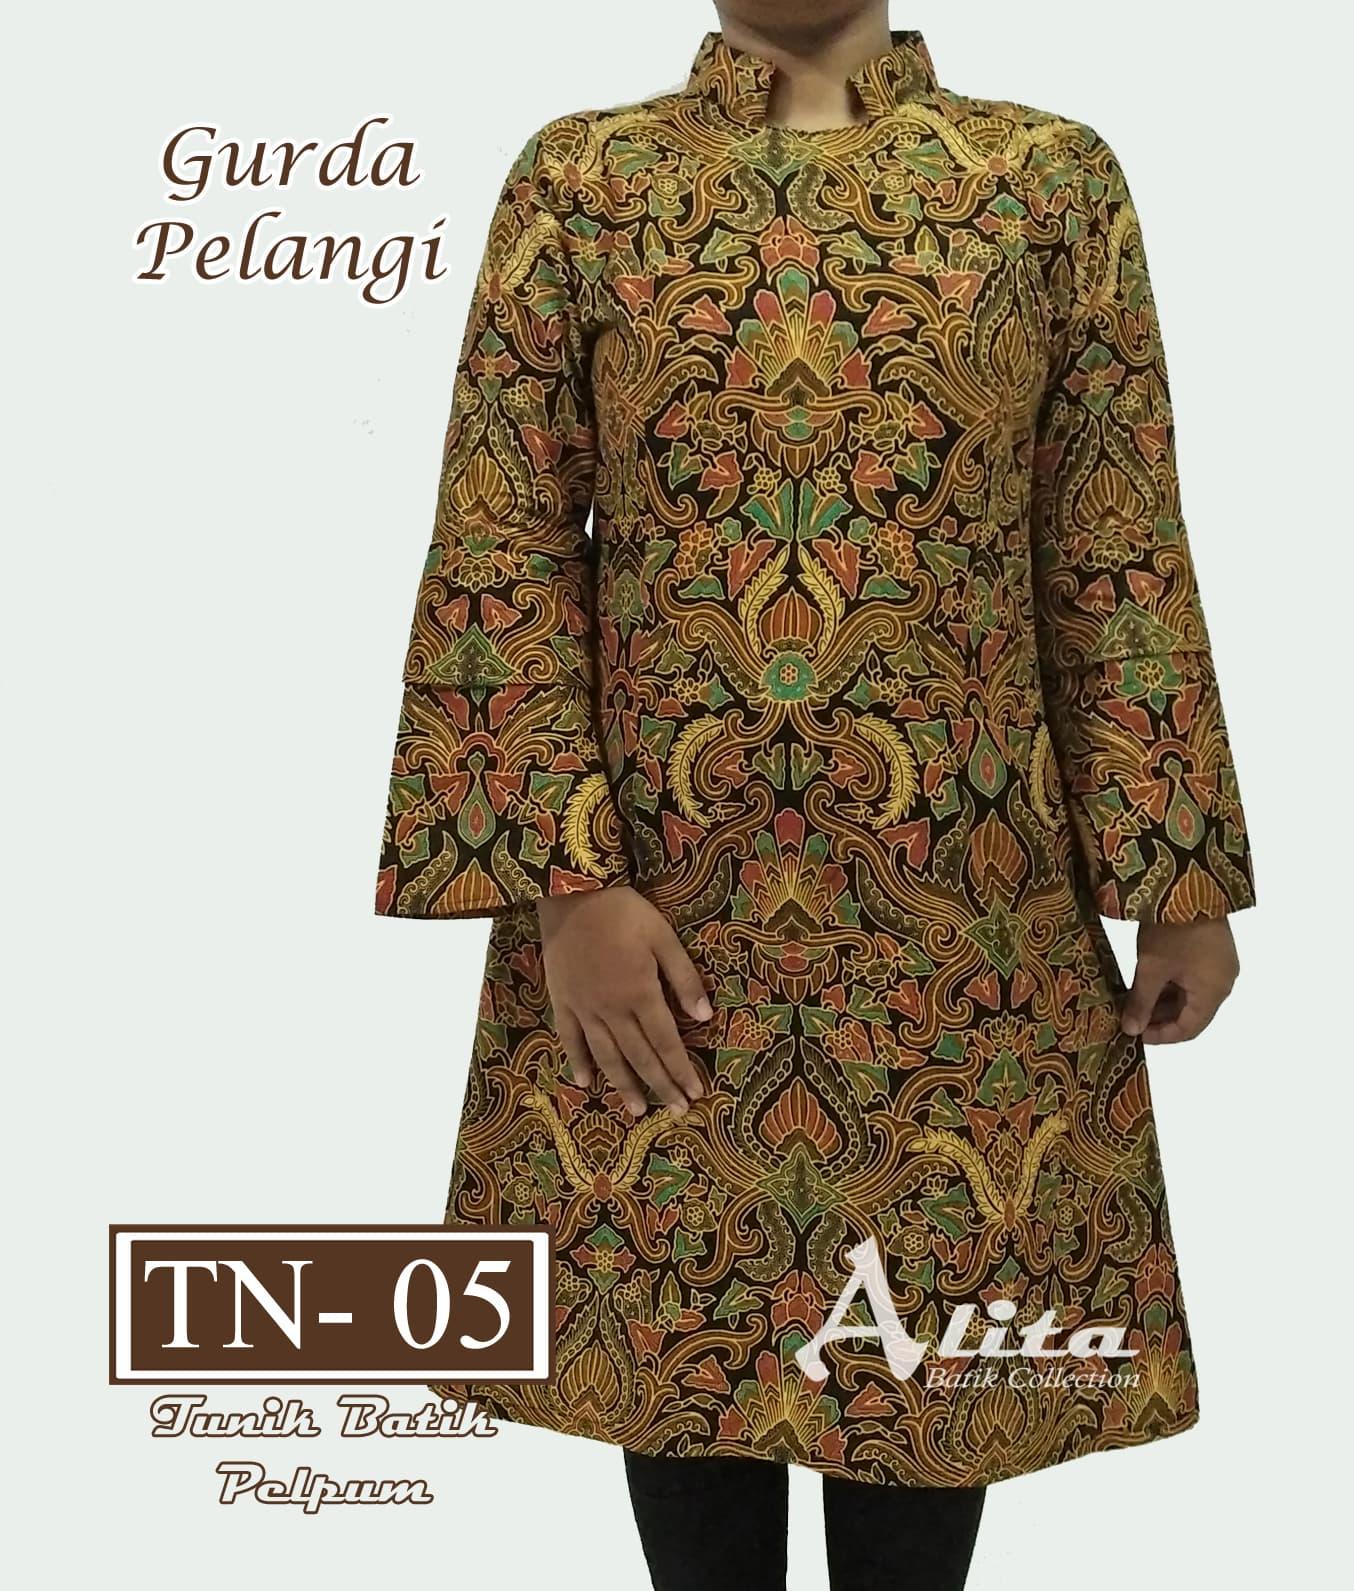 Jual Tunik Batik Wanita Dress Batik Baju Atasan Blouse Batik Wanita 05 Batik Alita